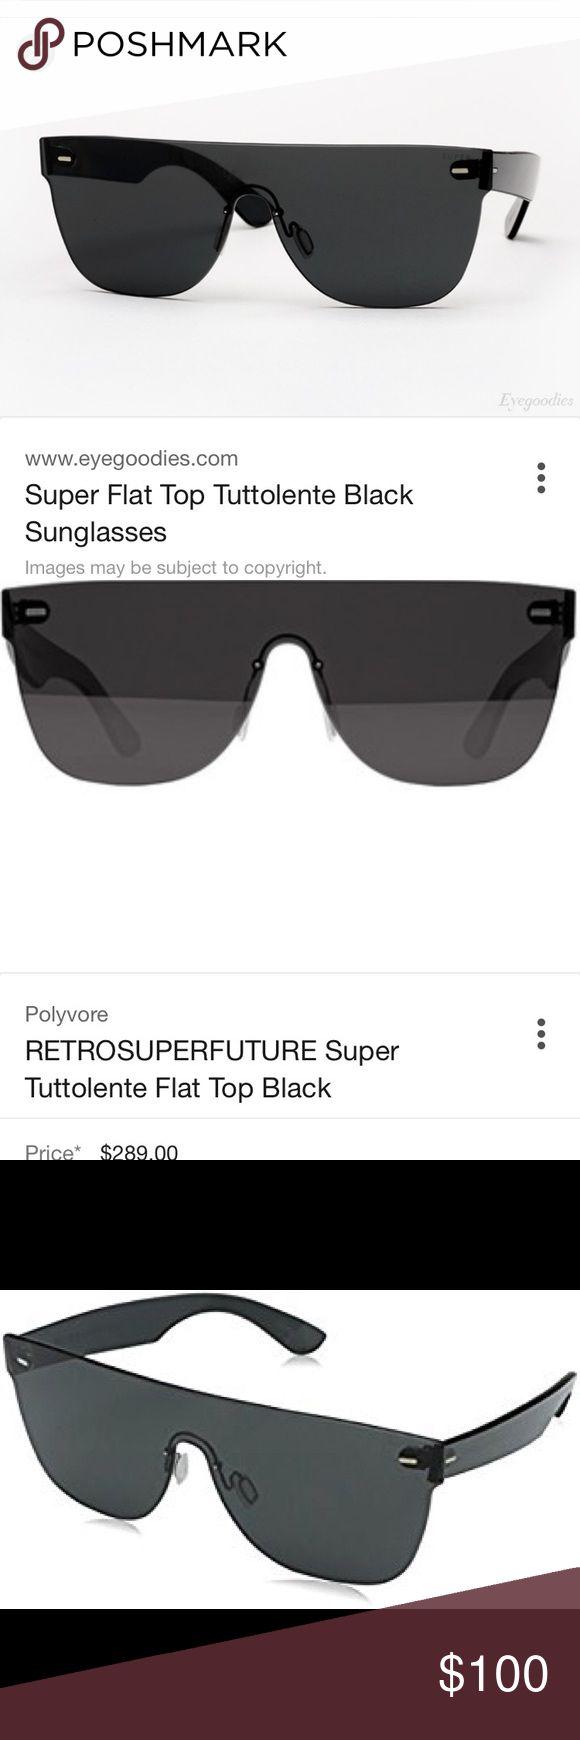 flat top sunglasses 9yum  Retro super future tuttolente flat top sunglasses